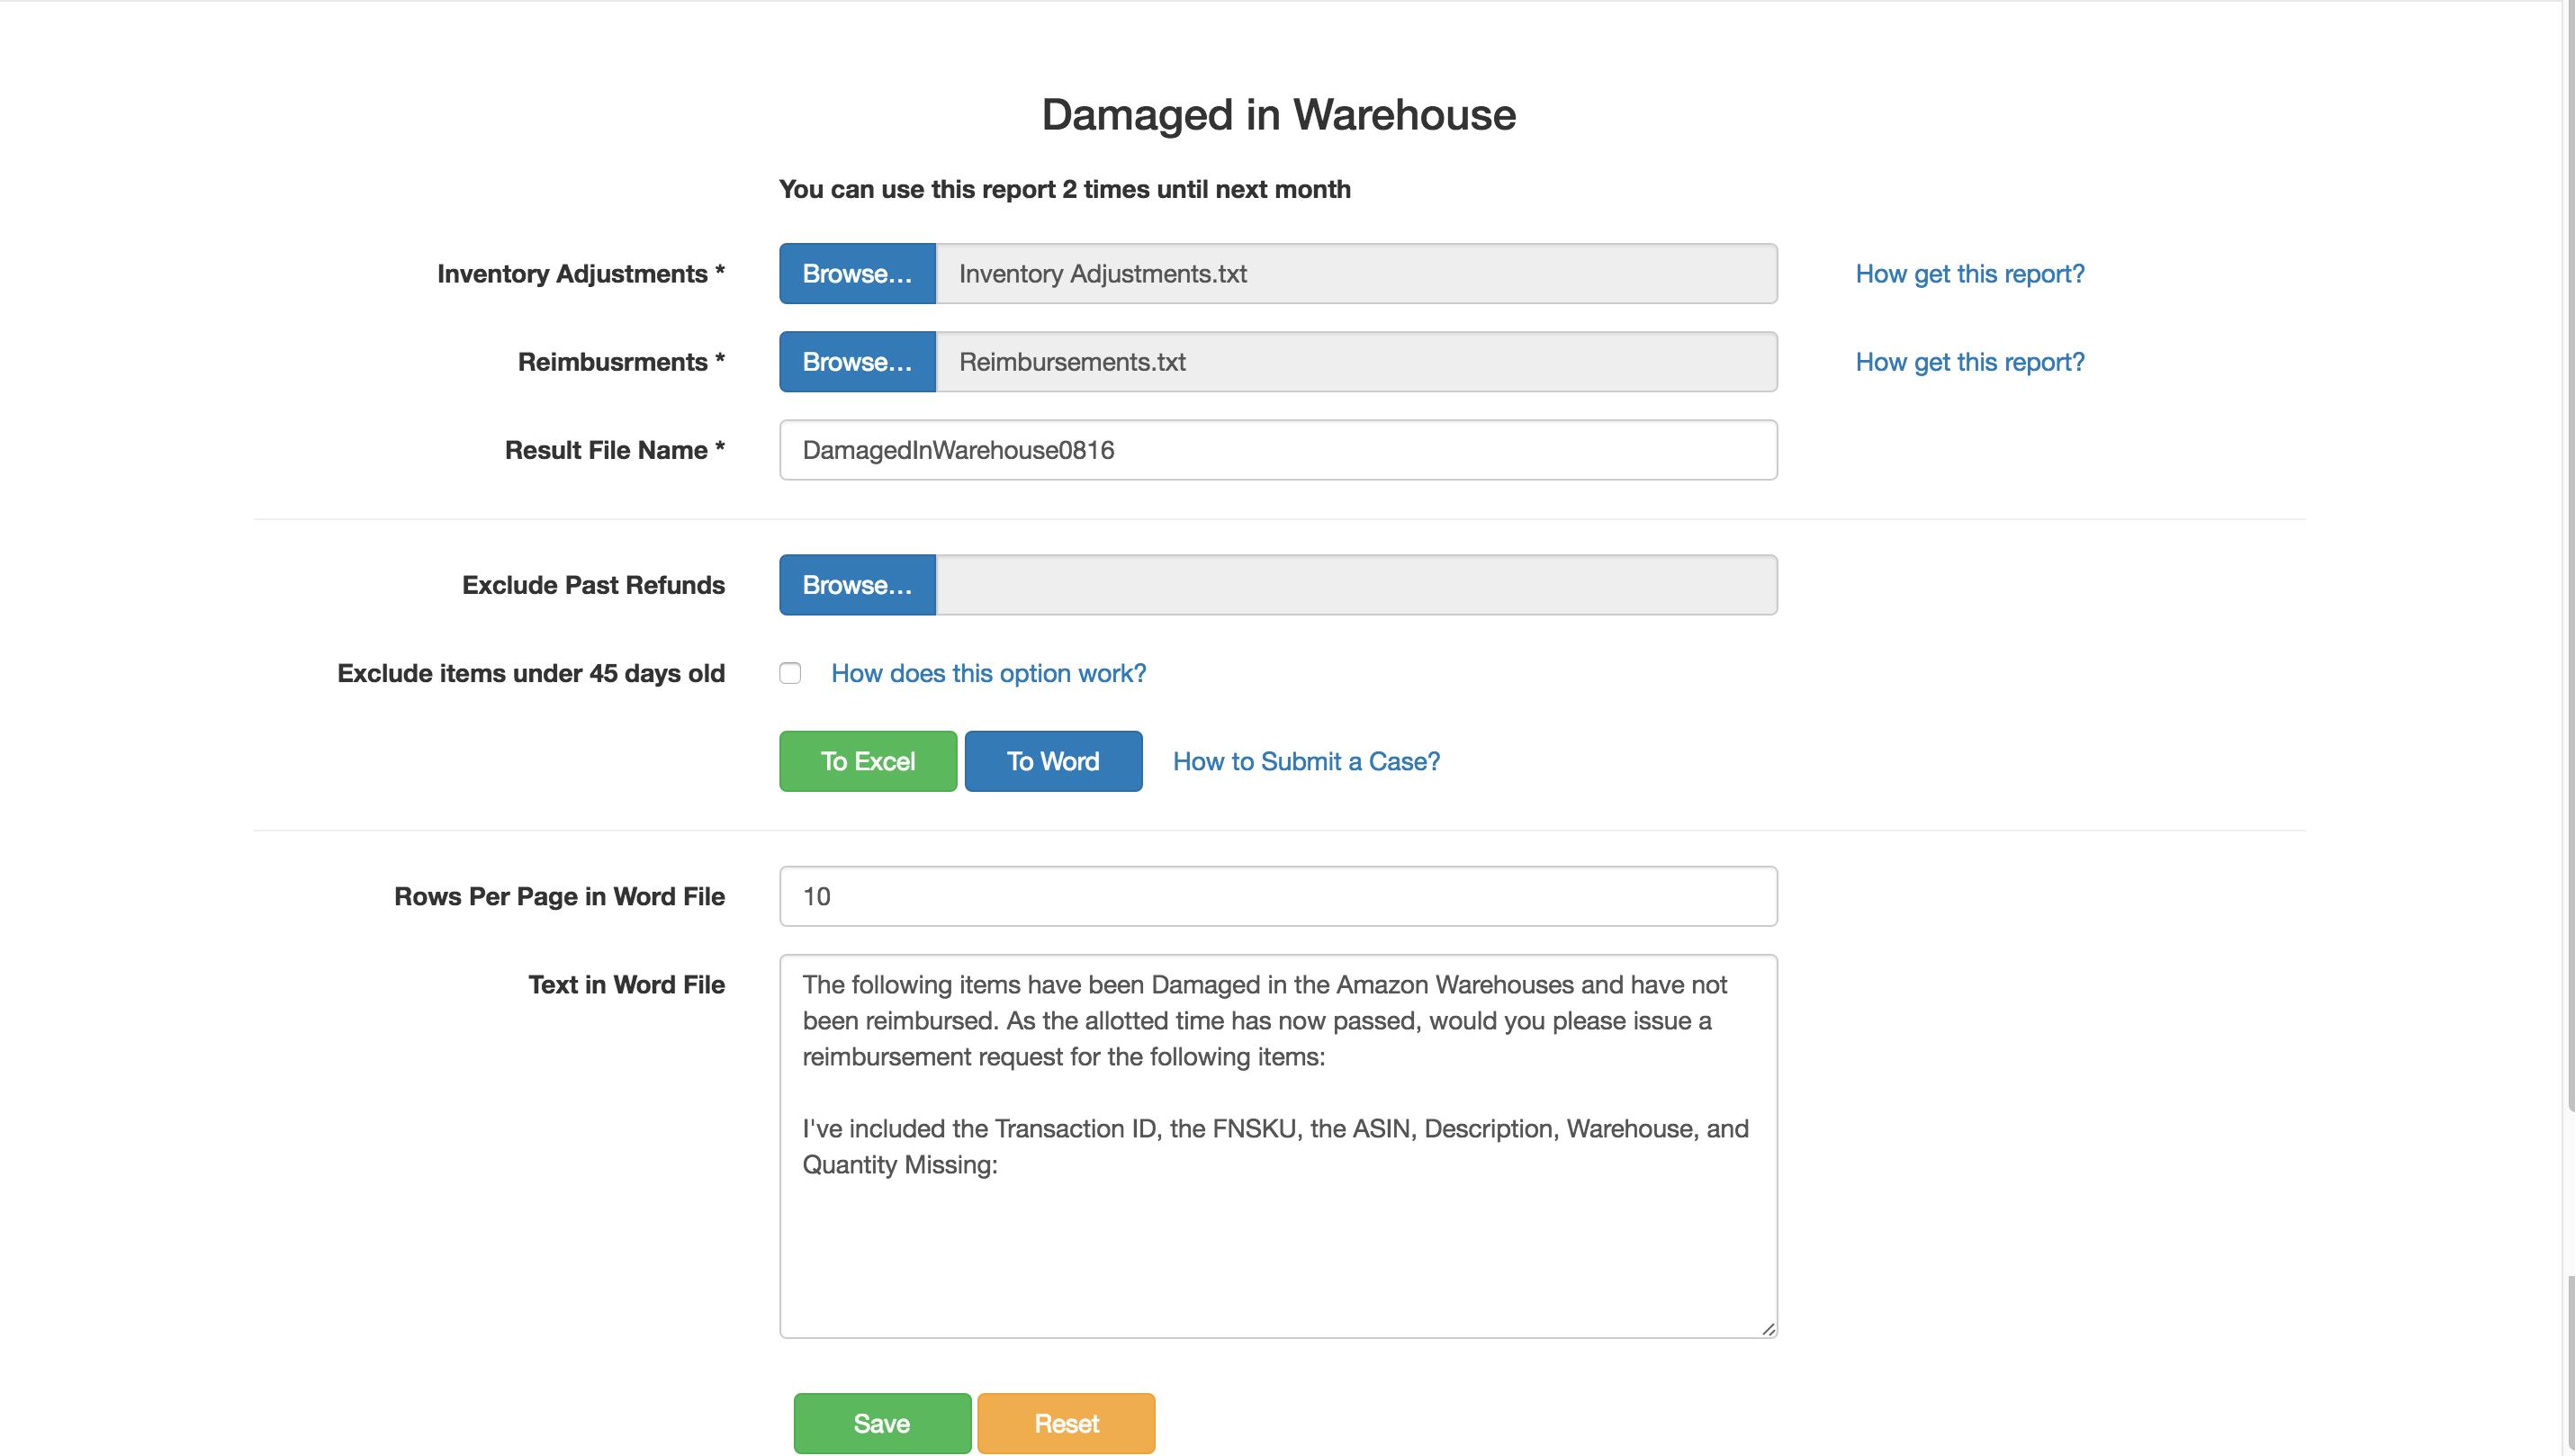 Damaged in Warehouse